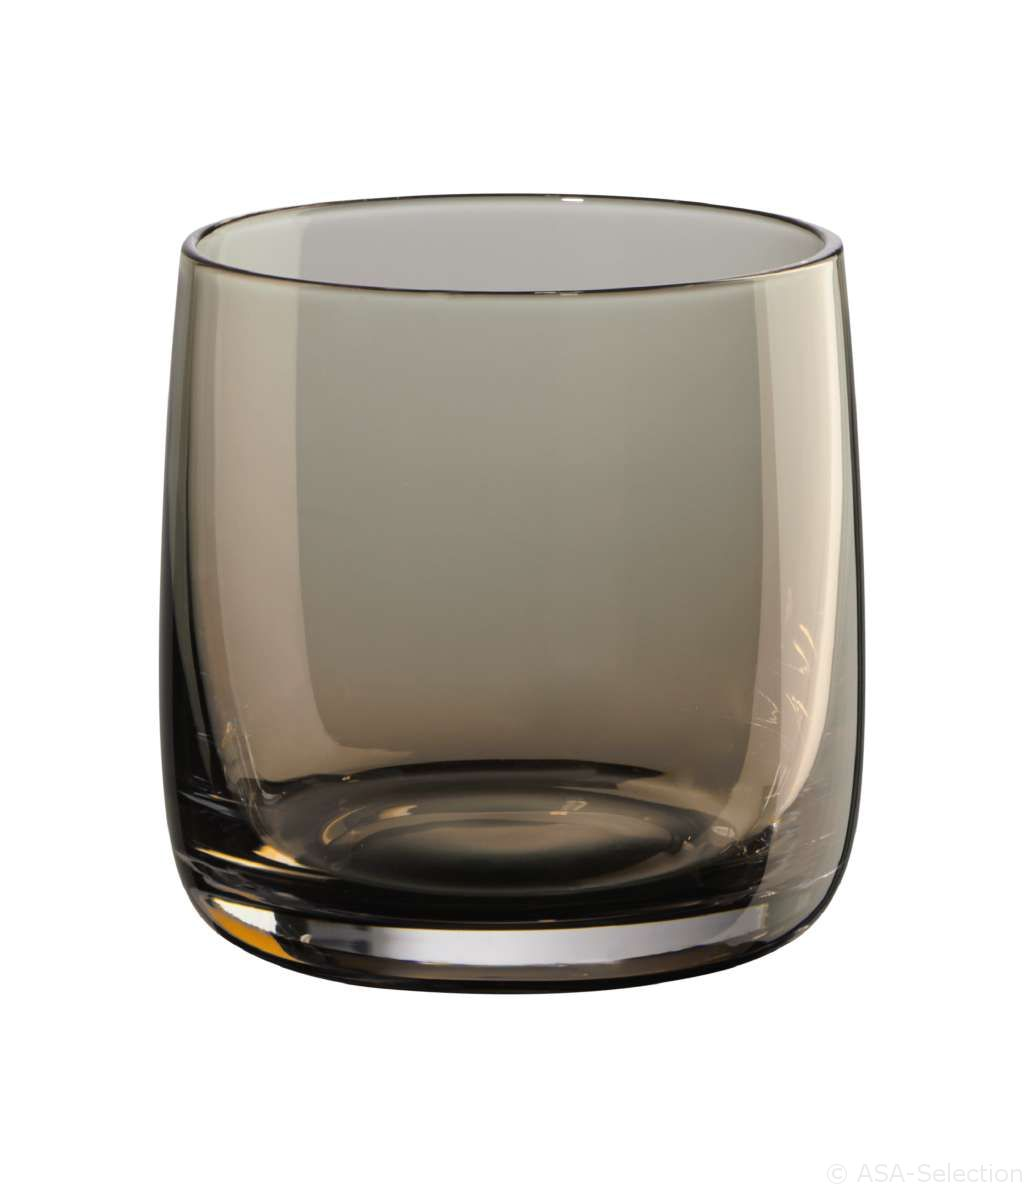 Glas, amber (2. Wahl)